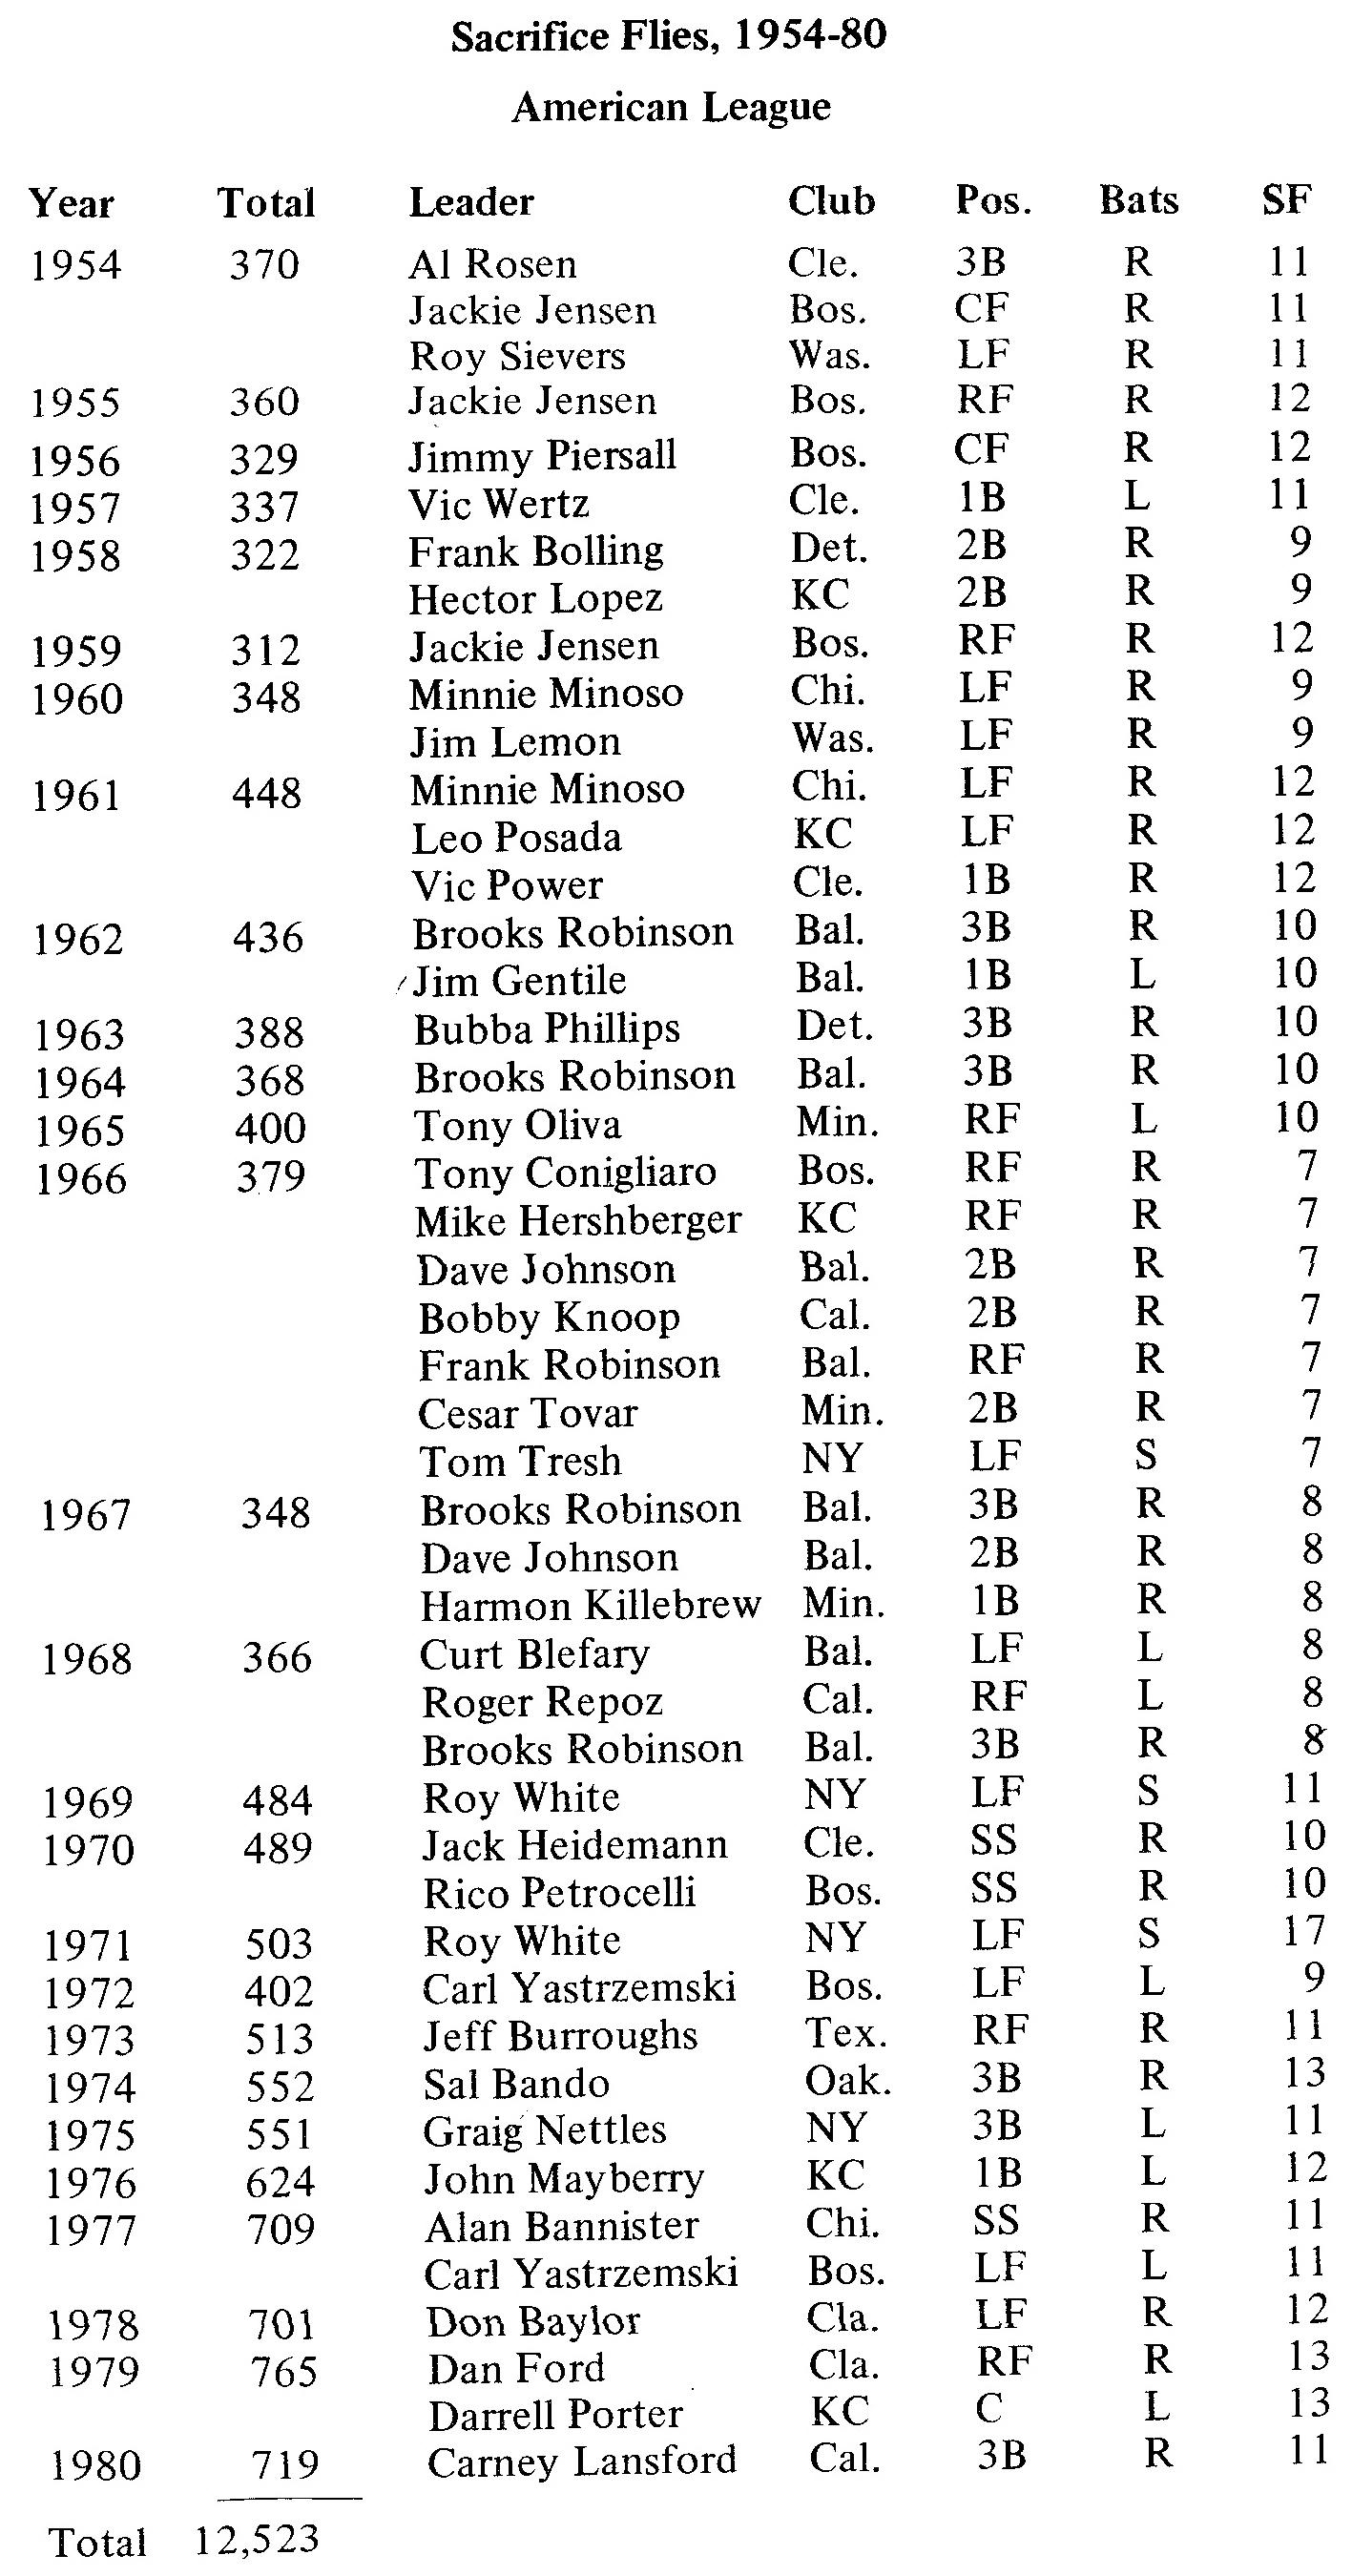 American League Sacrifice Flies, 1954-80